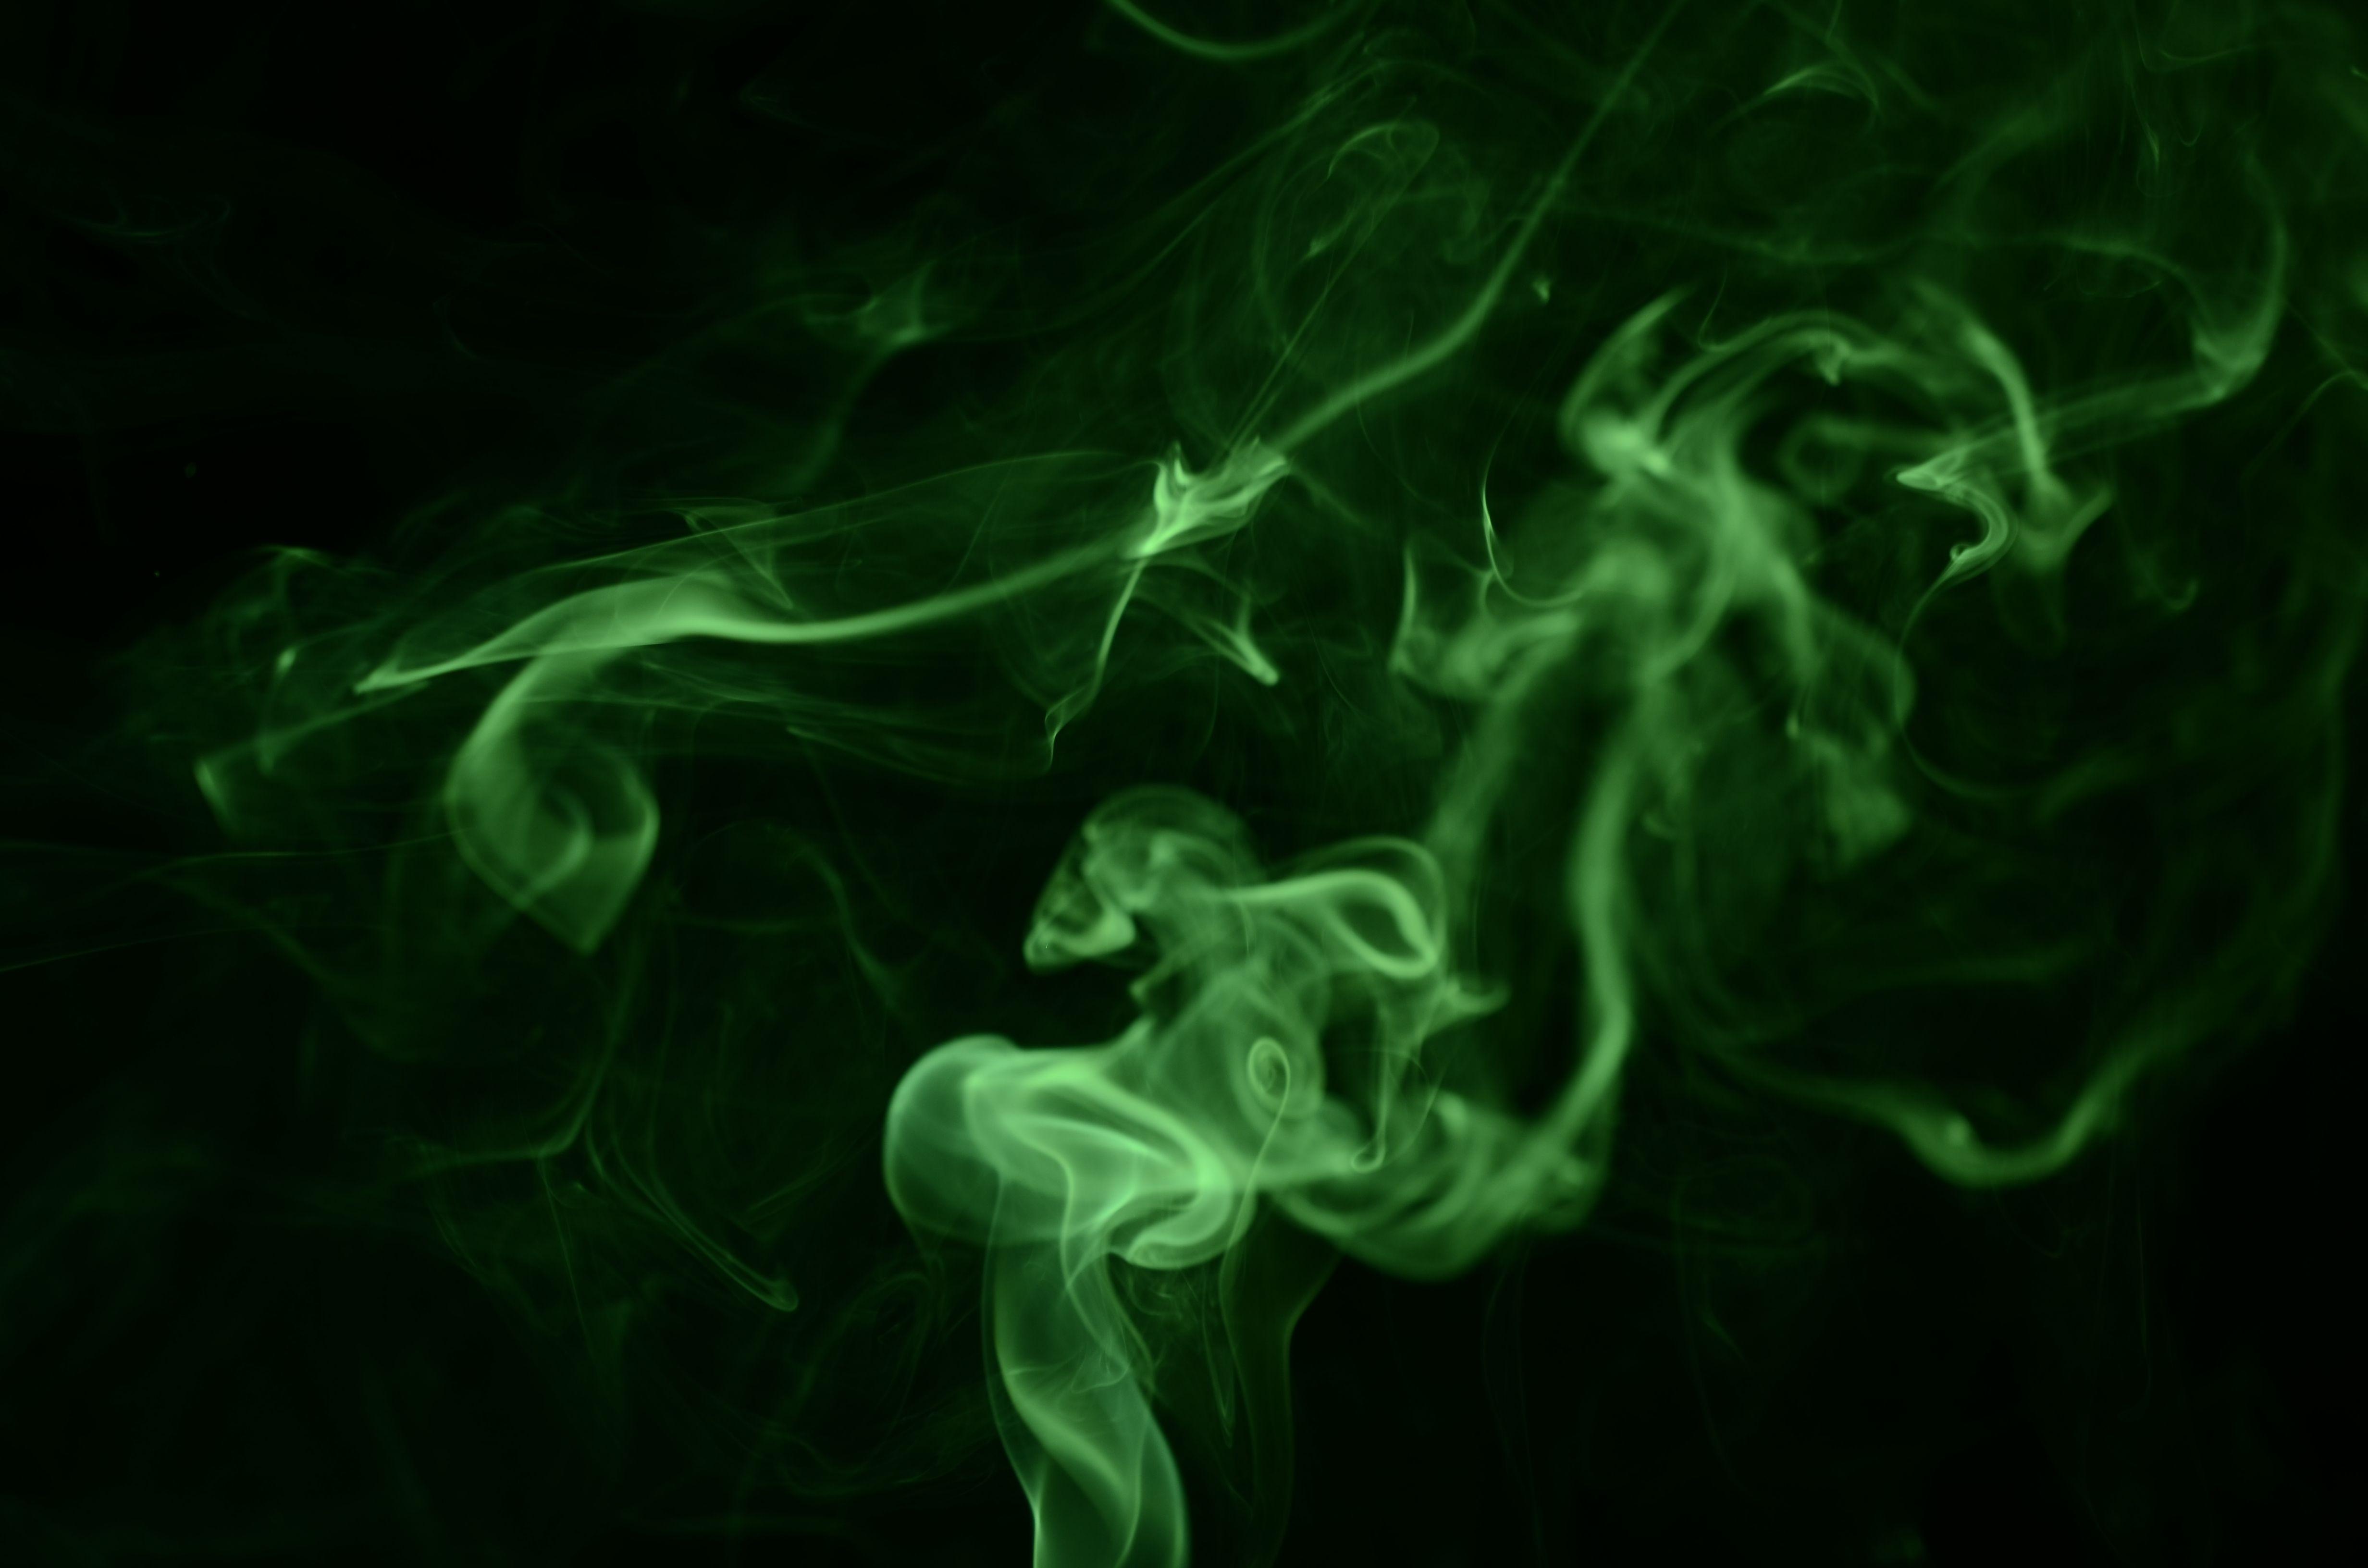 Green Smoke Save The Date Smoke Background Dark Green Aesthetic Slytherin Aesthetic